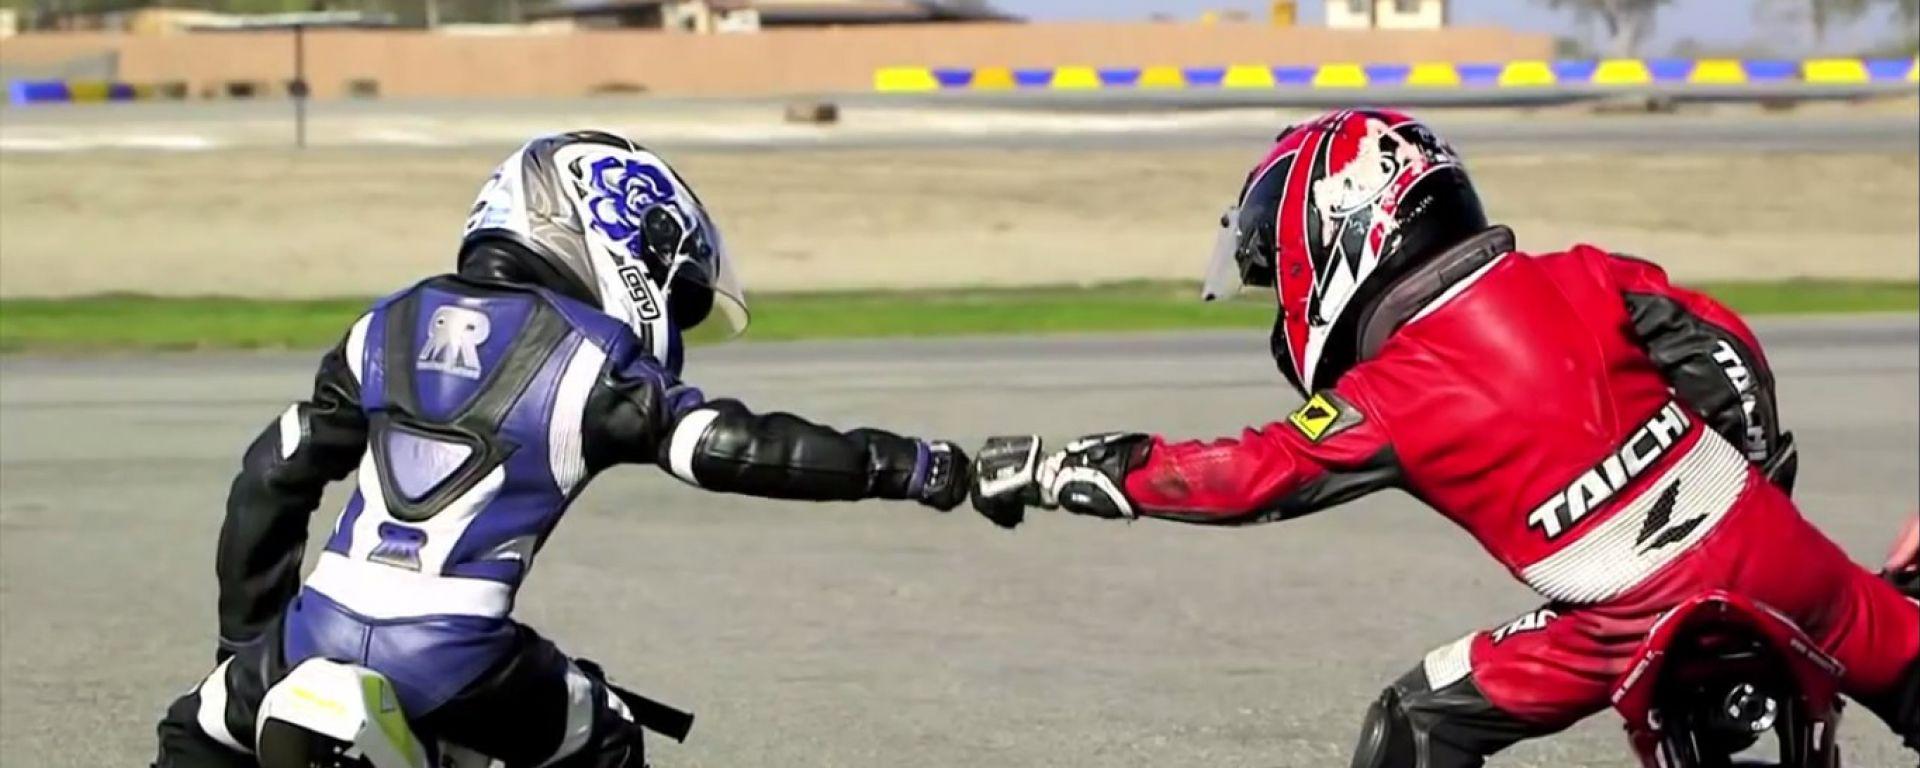 Why we ride, il film